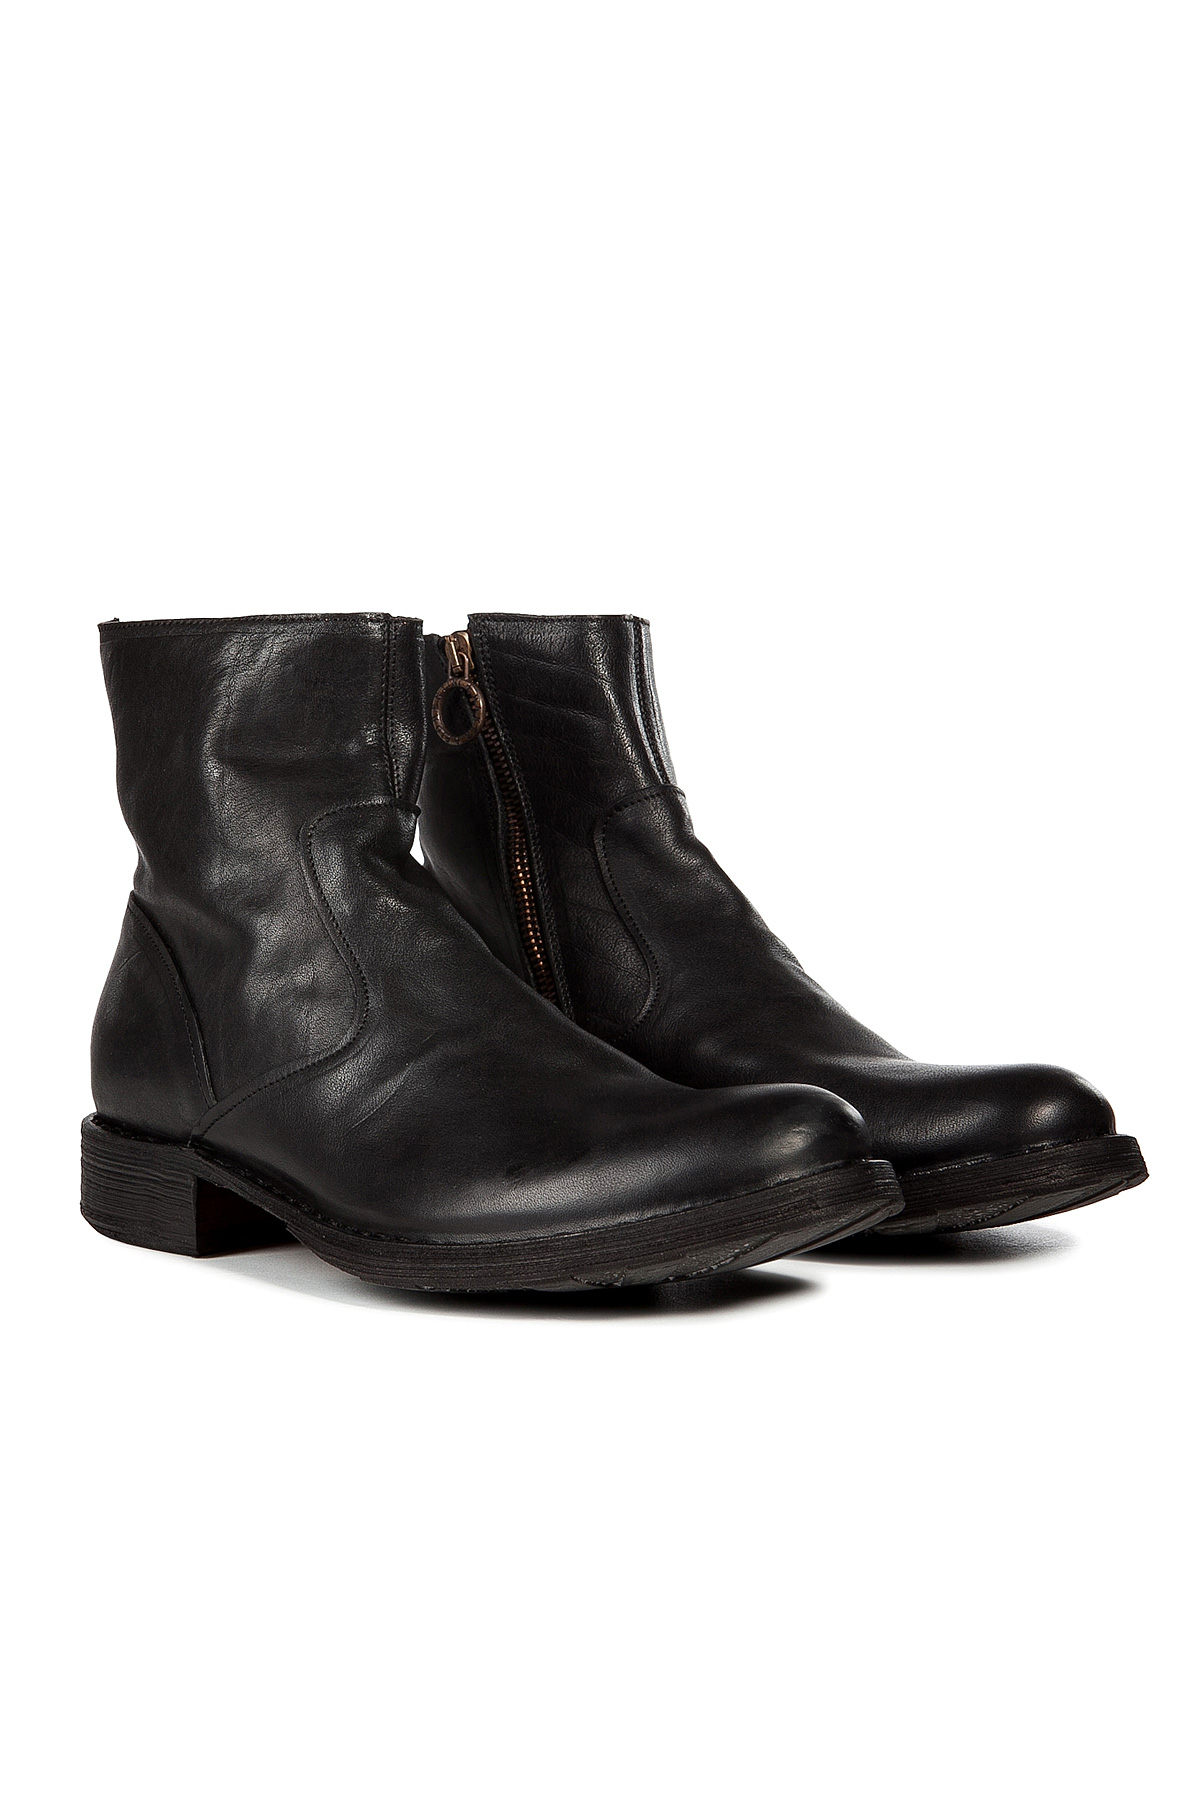 fiorentini baker leather eternity boots black in black. Black Bedroom Furniture Sets. Home Design Ideas